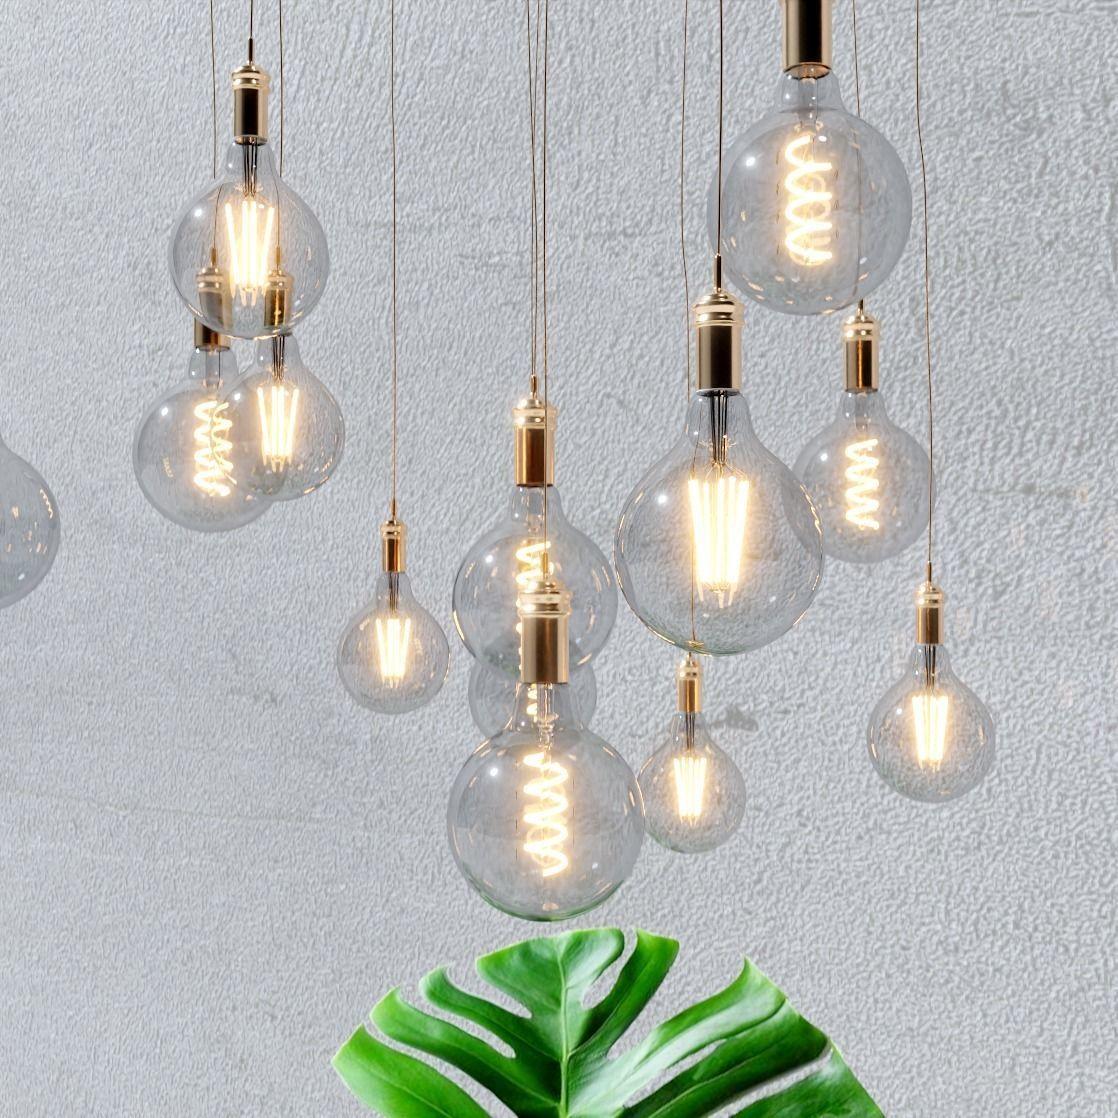 models of decorative light bulbs